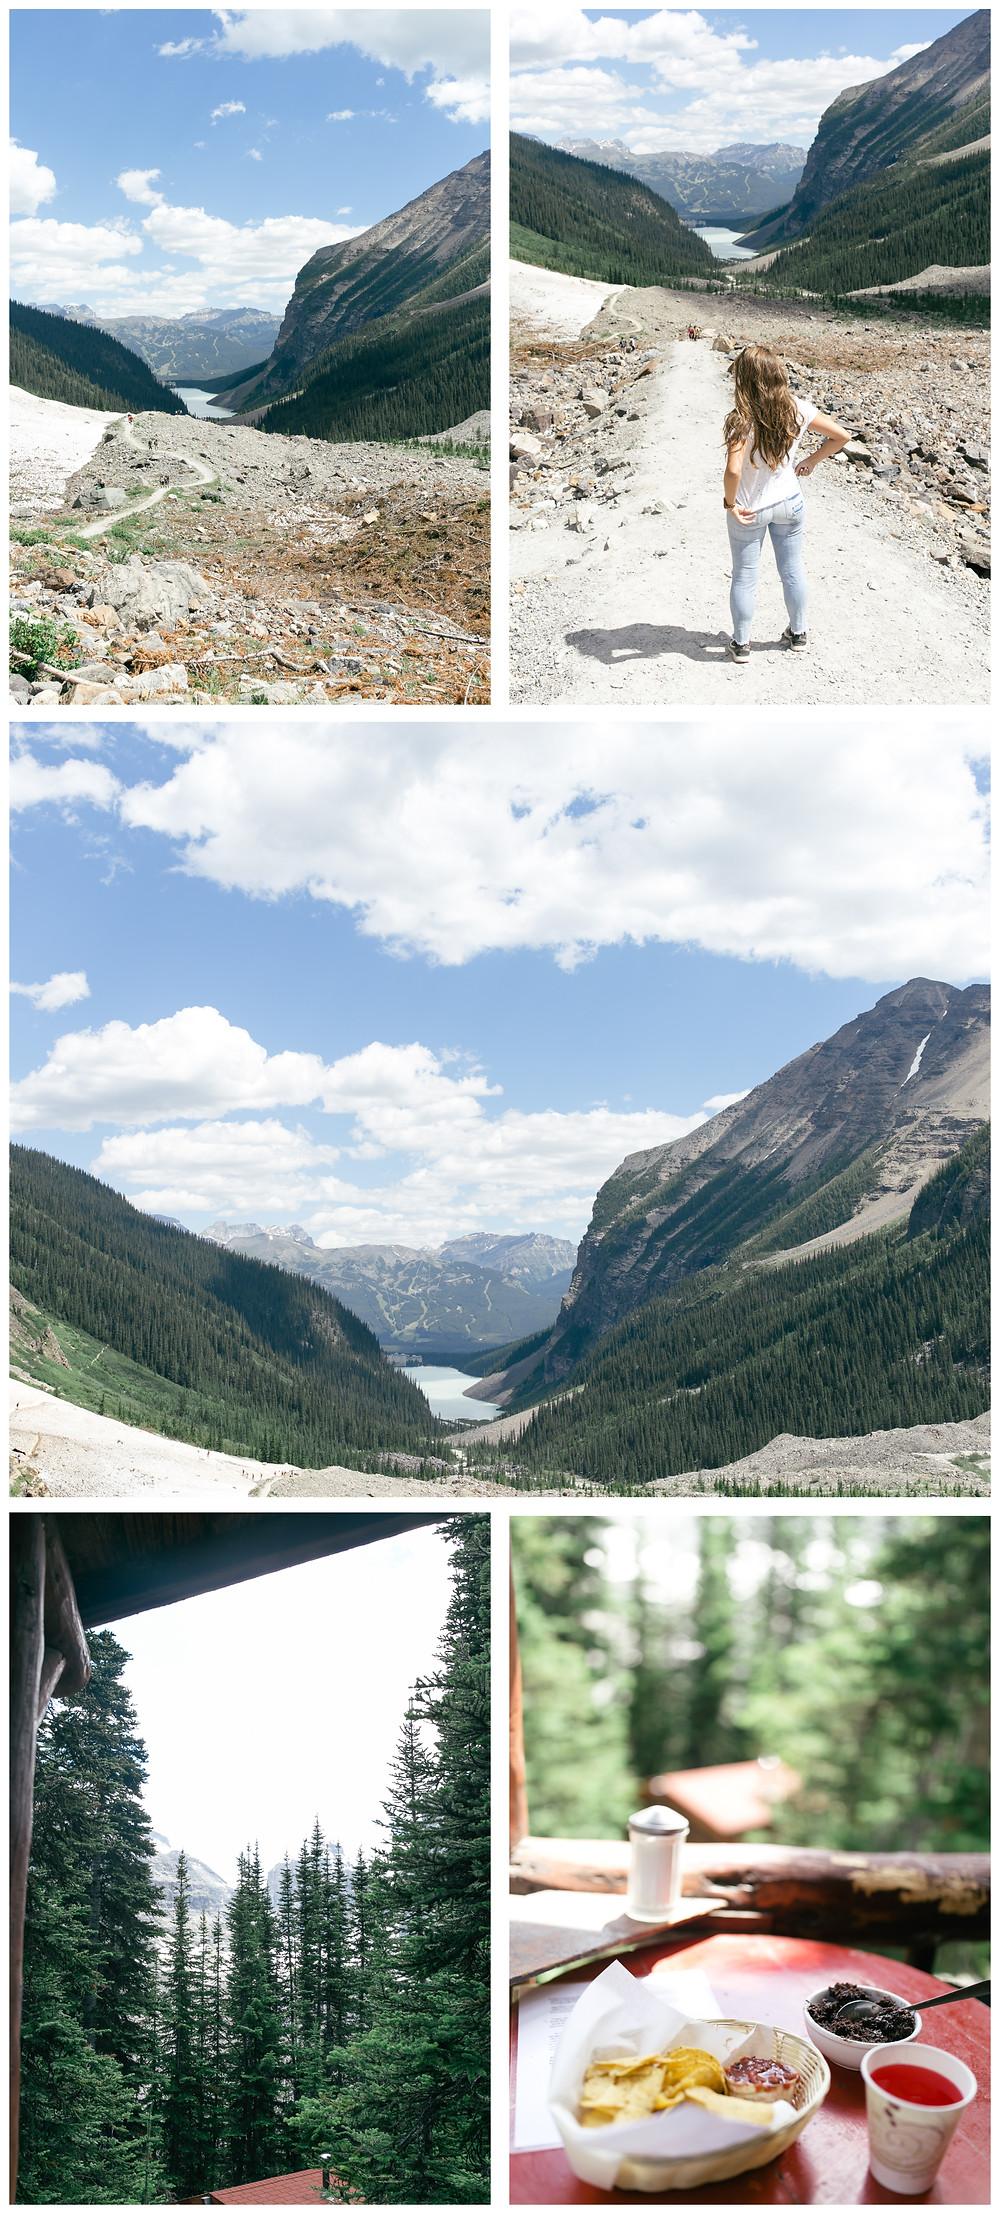 Plain of Six Glaciers Tea House, Banff